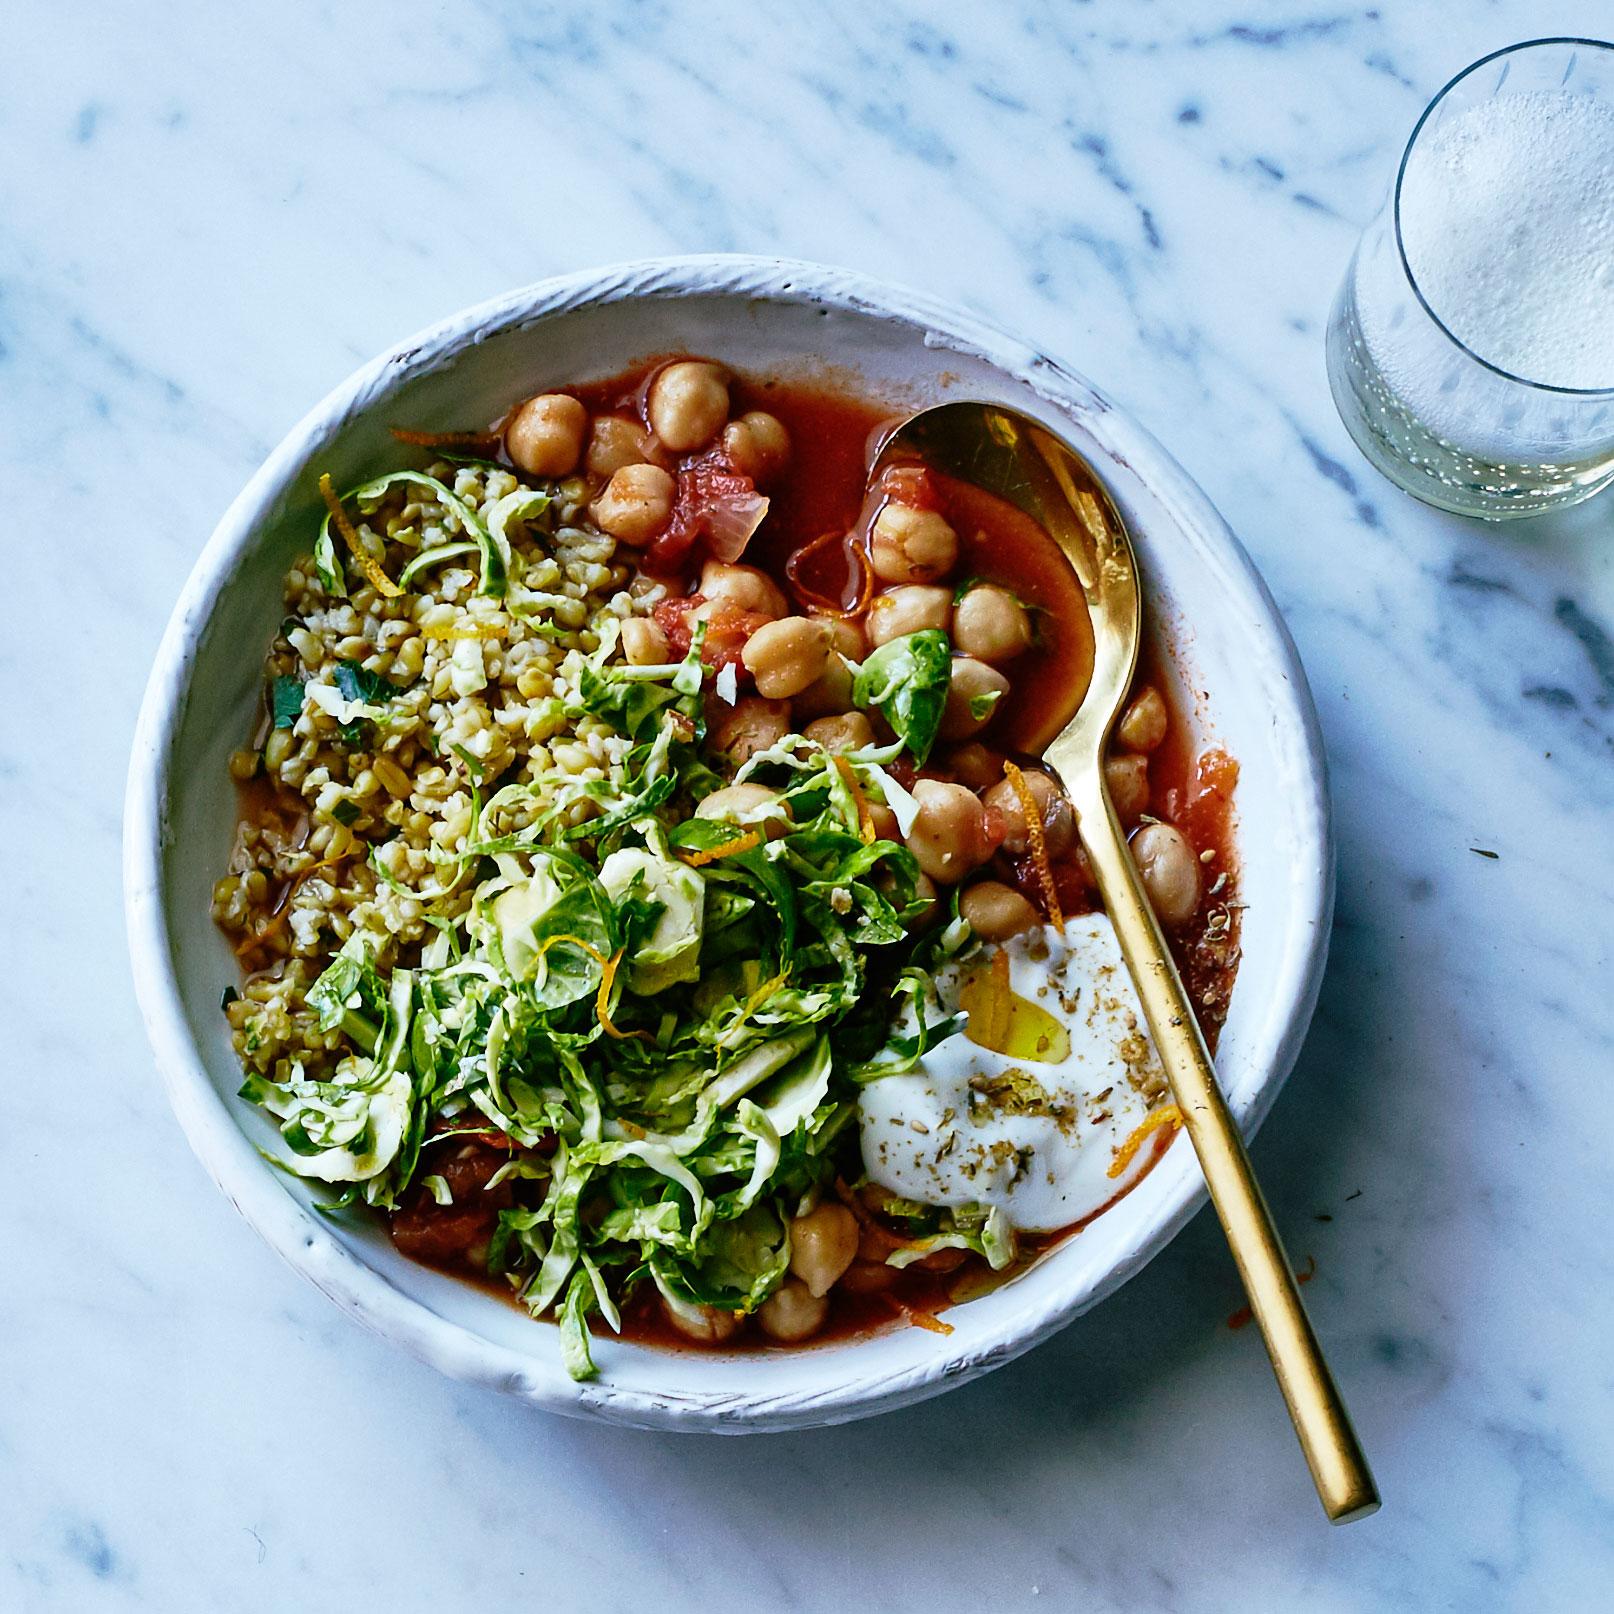 saffron-tomato-chickpeas-freekeh-brussels-sprouts-su.jpg